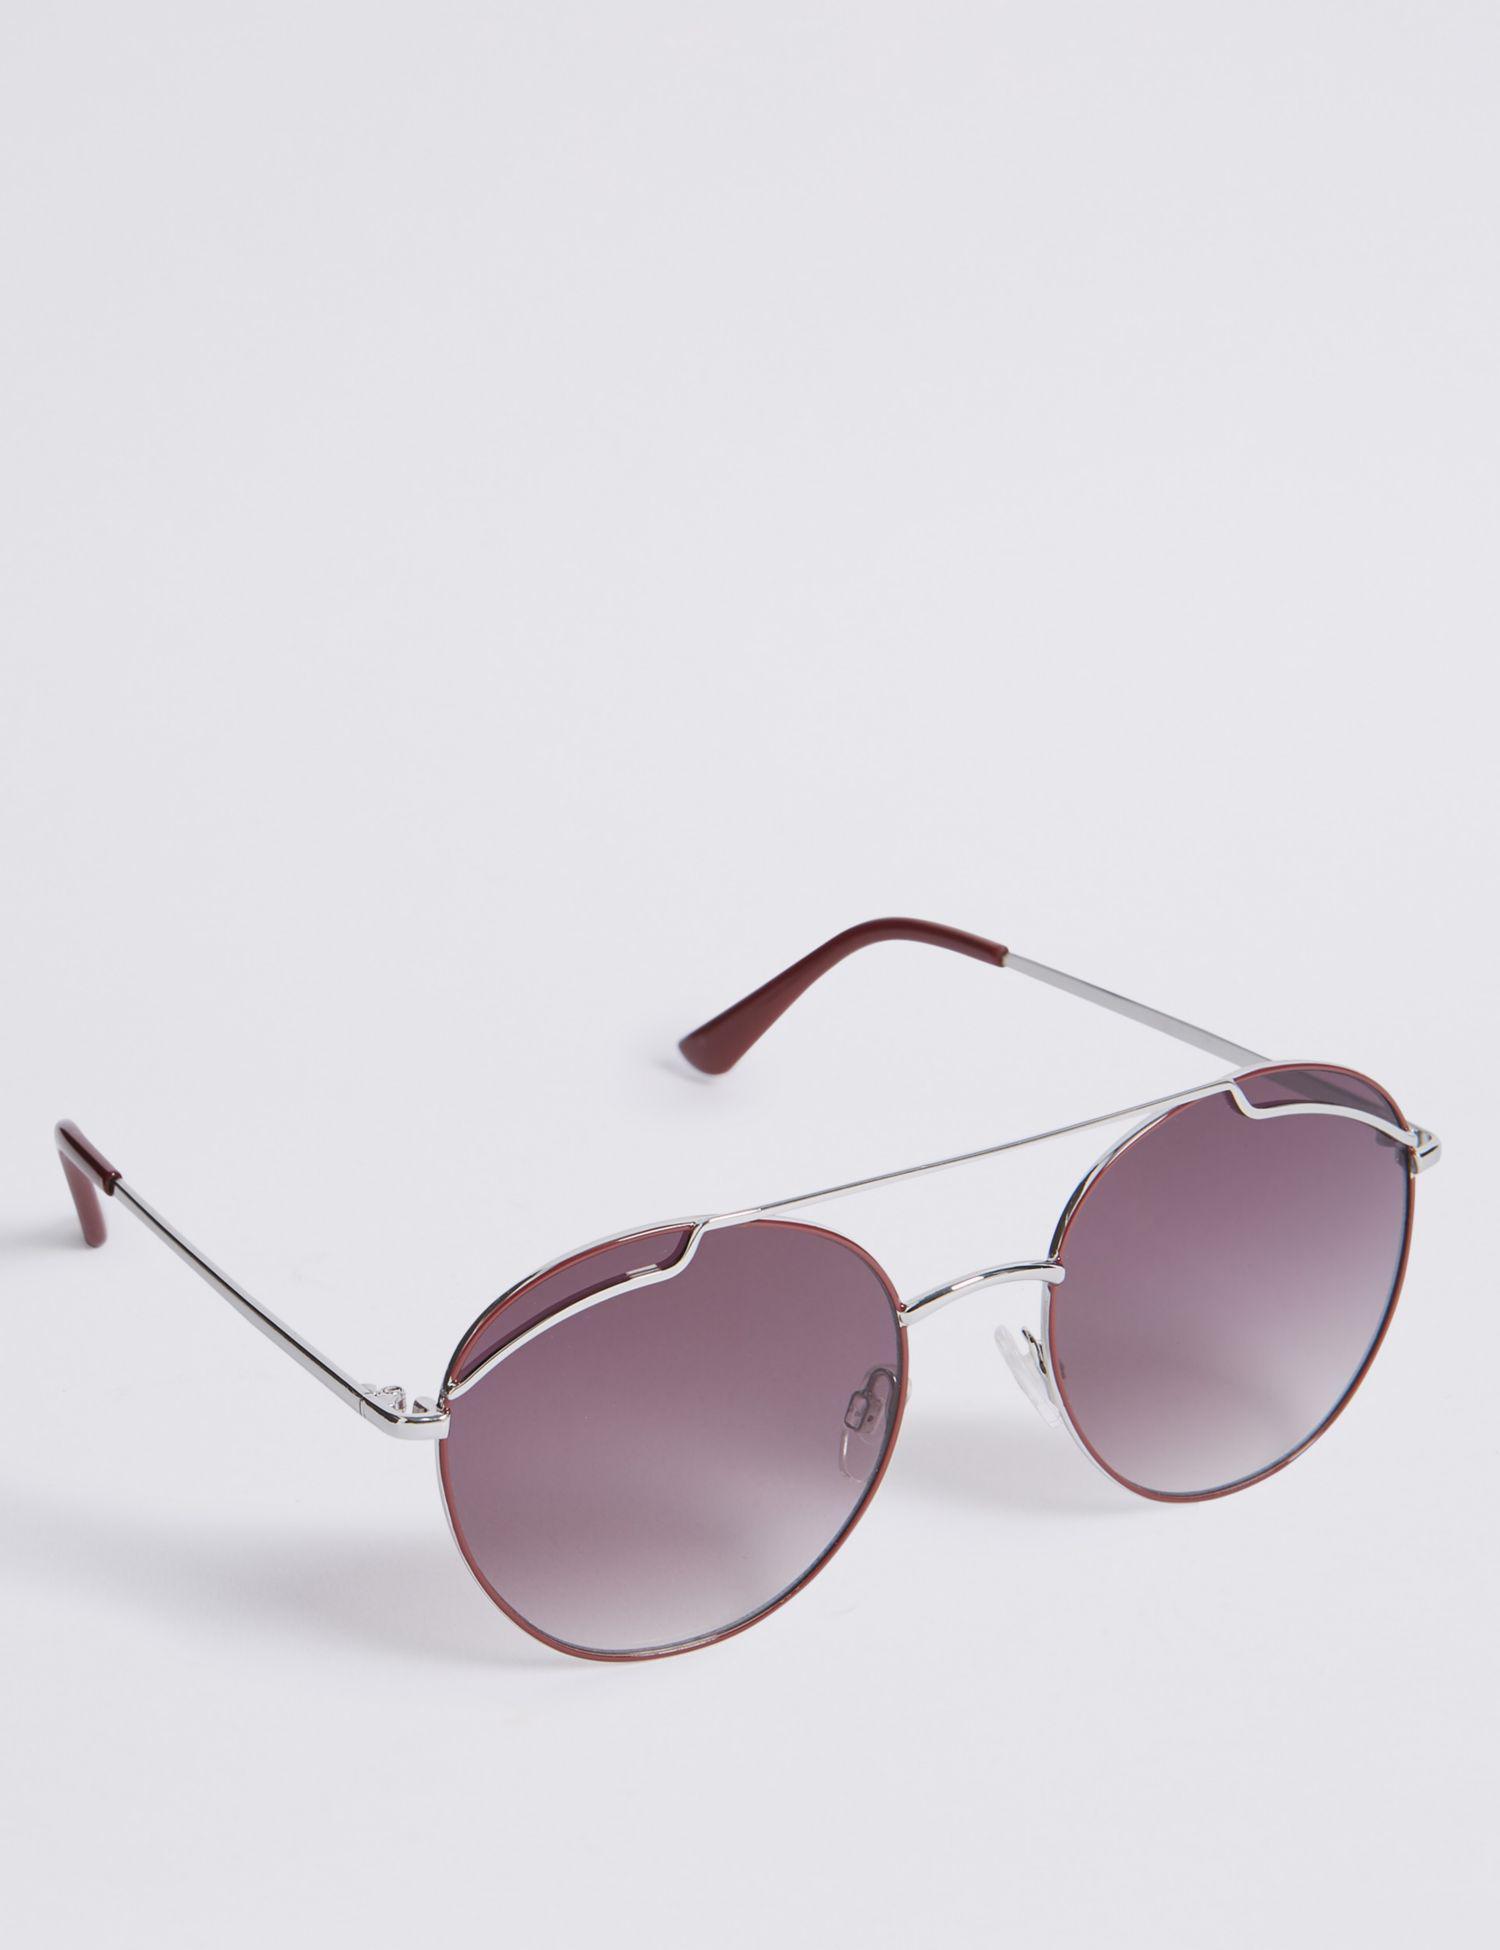 c4536ba79c5 Marks   Spencer Round Aviator Sunglasses - Lyst